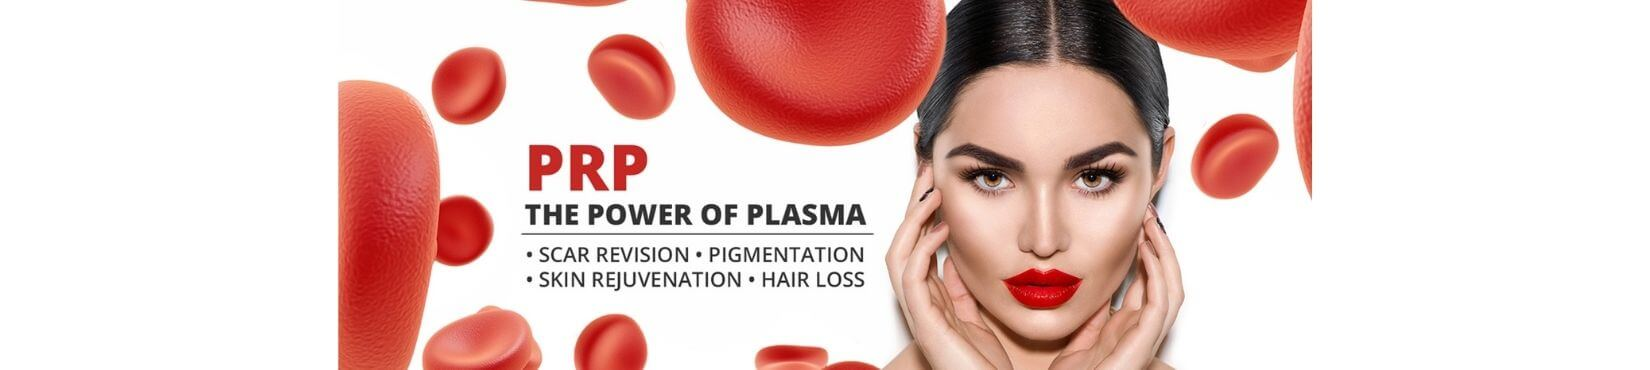 PRP - power of plasma